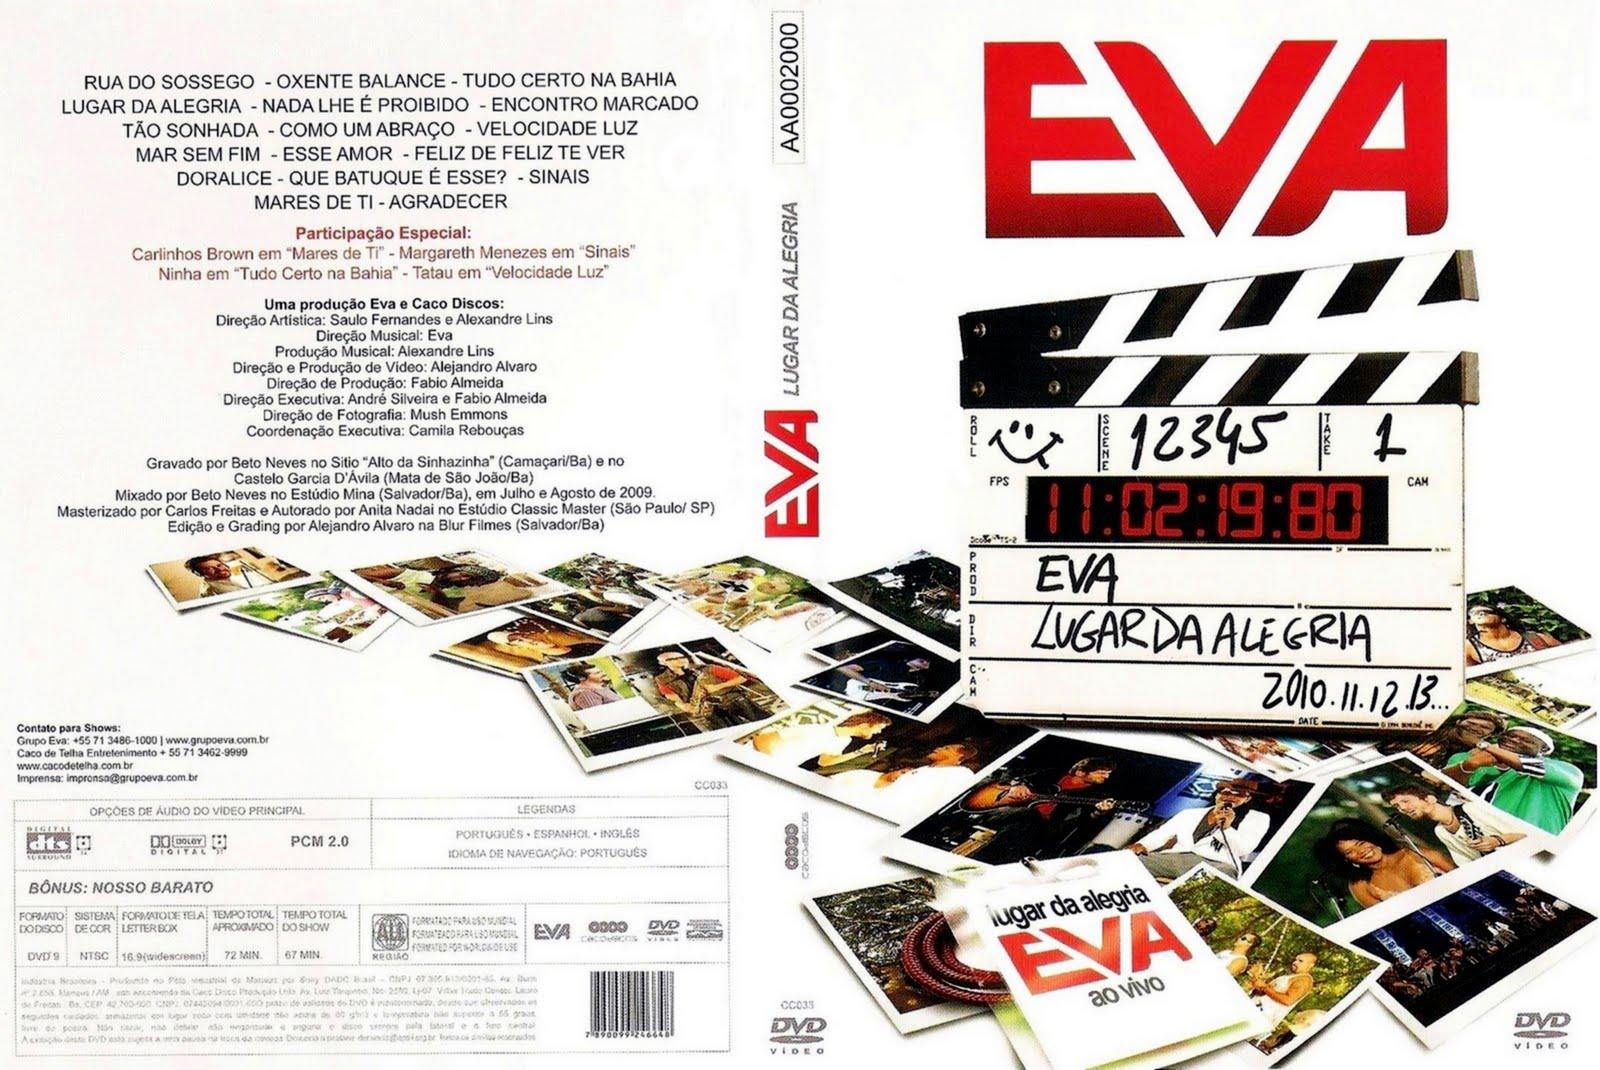 http://4.bp.blogspot.com/_2E1MH2WI9T8/S9s1H_xLRpI/AAAAAAAAABo/QF0o5HExYpE/s1600/Banda+Eva+%E2%80%93+Lugar+Da+Alegria.jpg